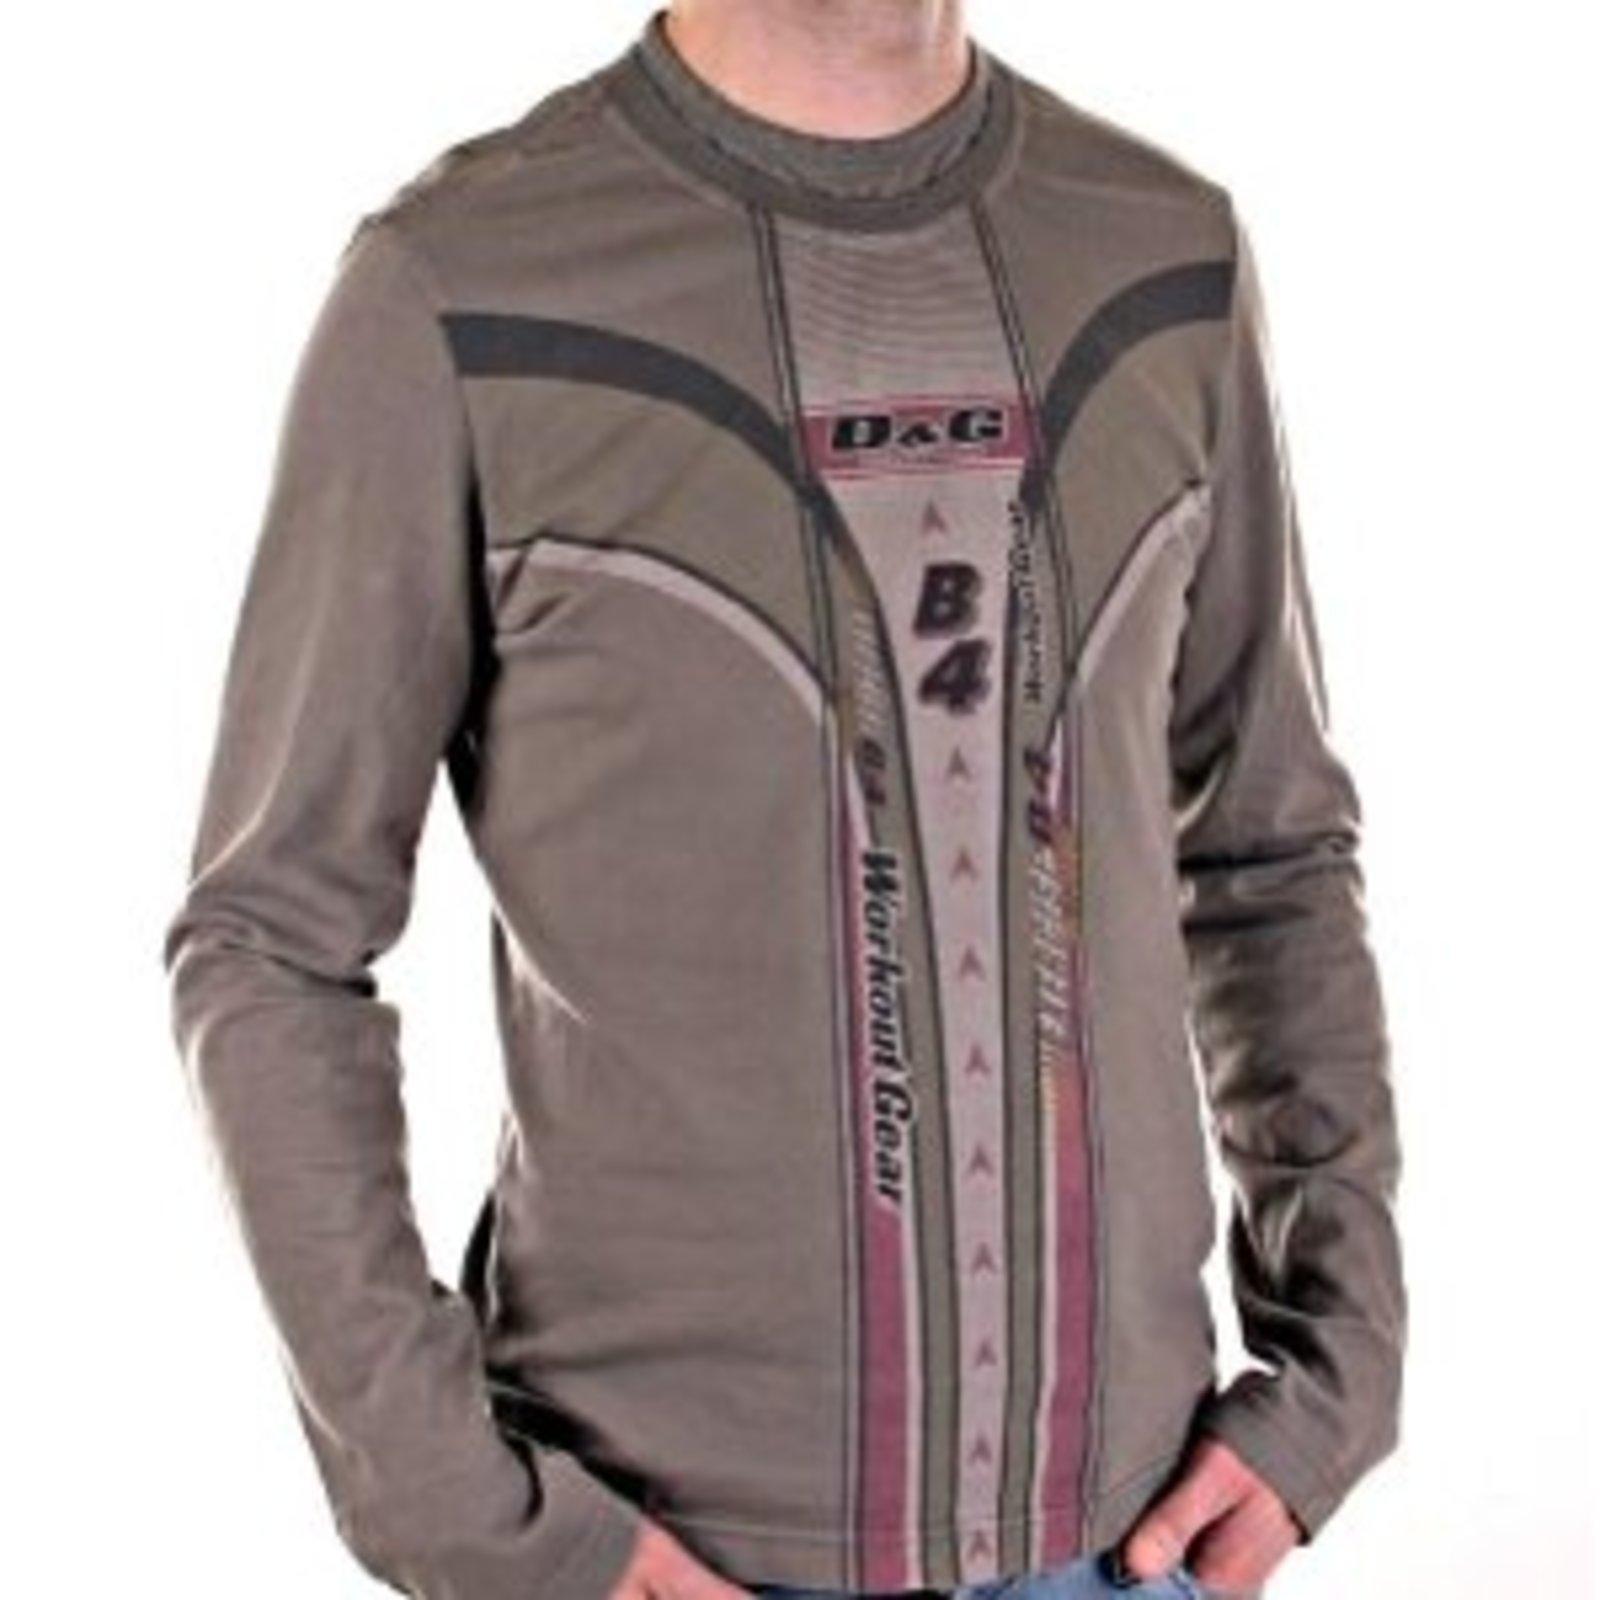 c1ae387d D&G t-shirt Dolce & Gabbana mens washed khaki slim fit top DGM3025 at  Togged Clothing